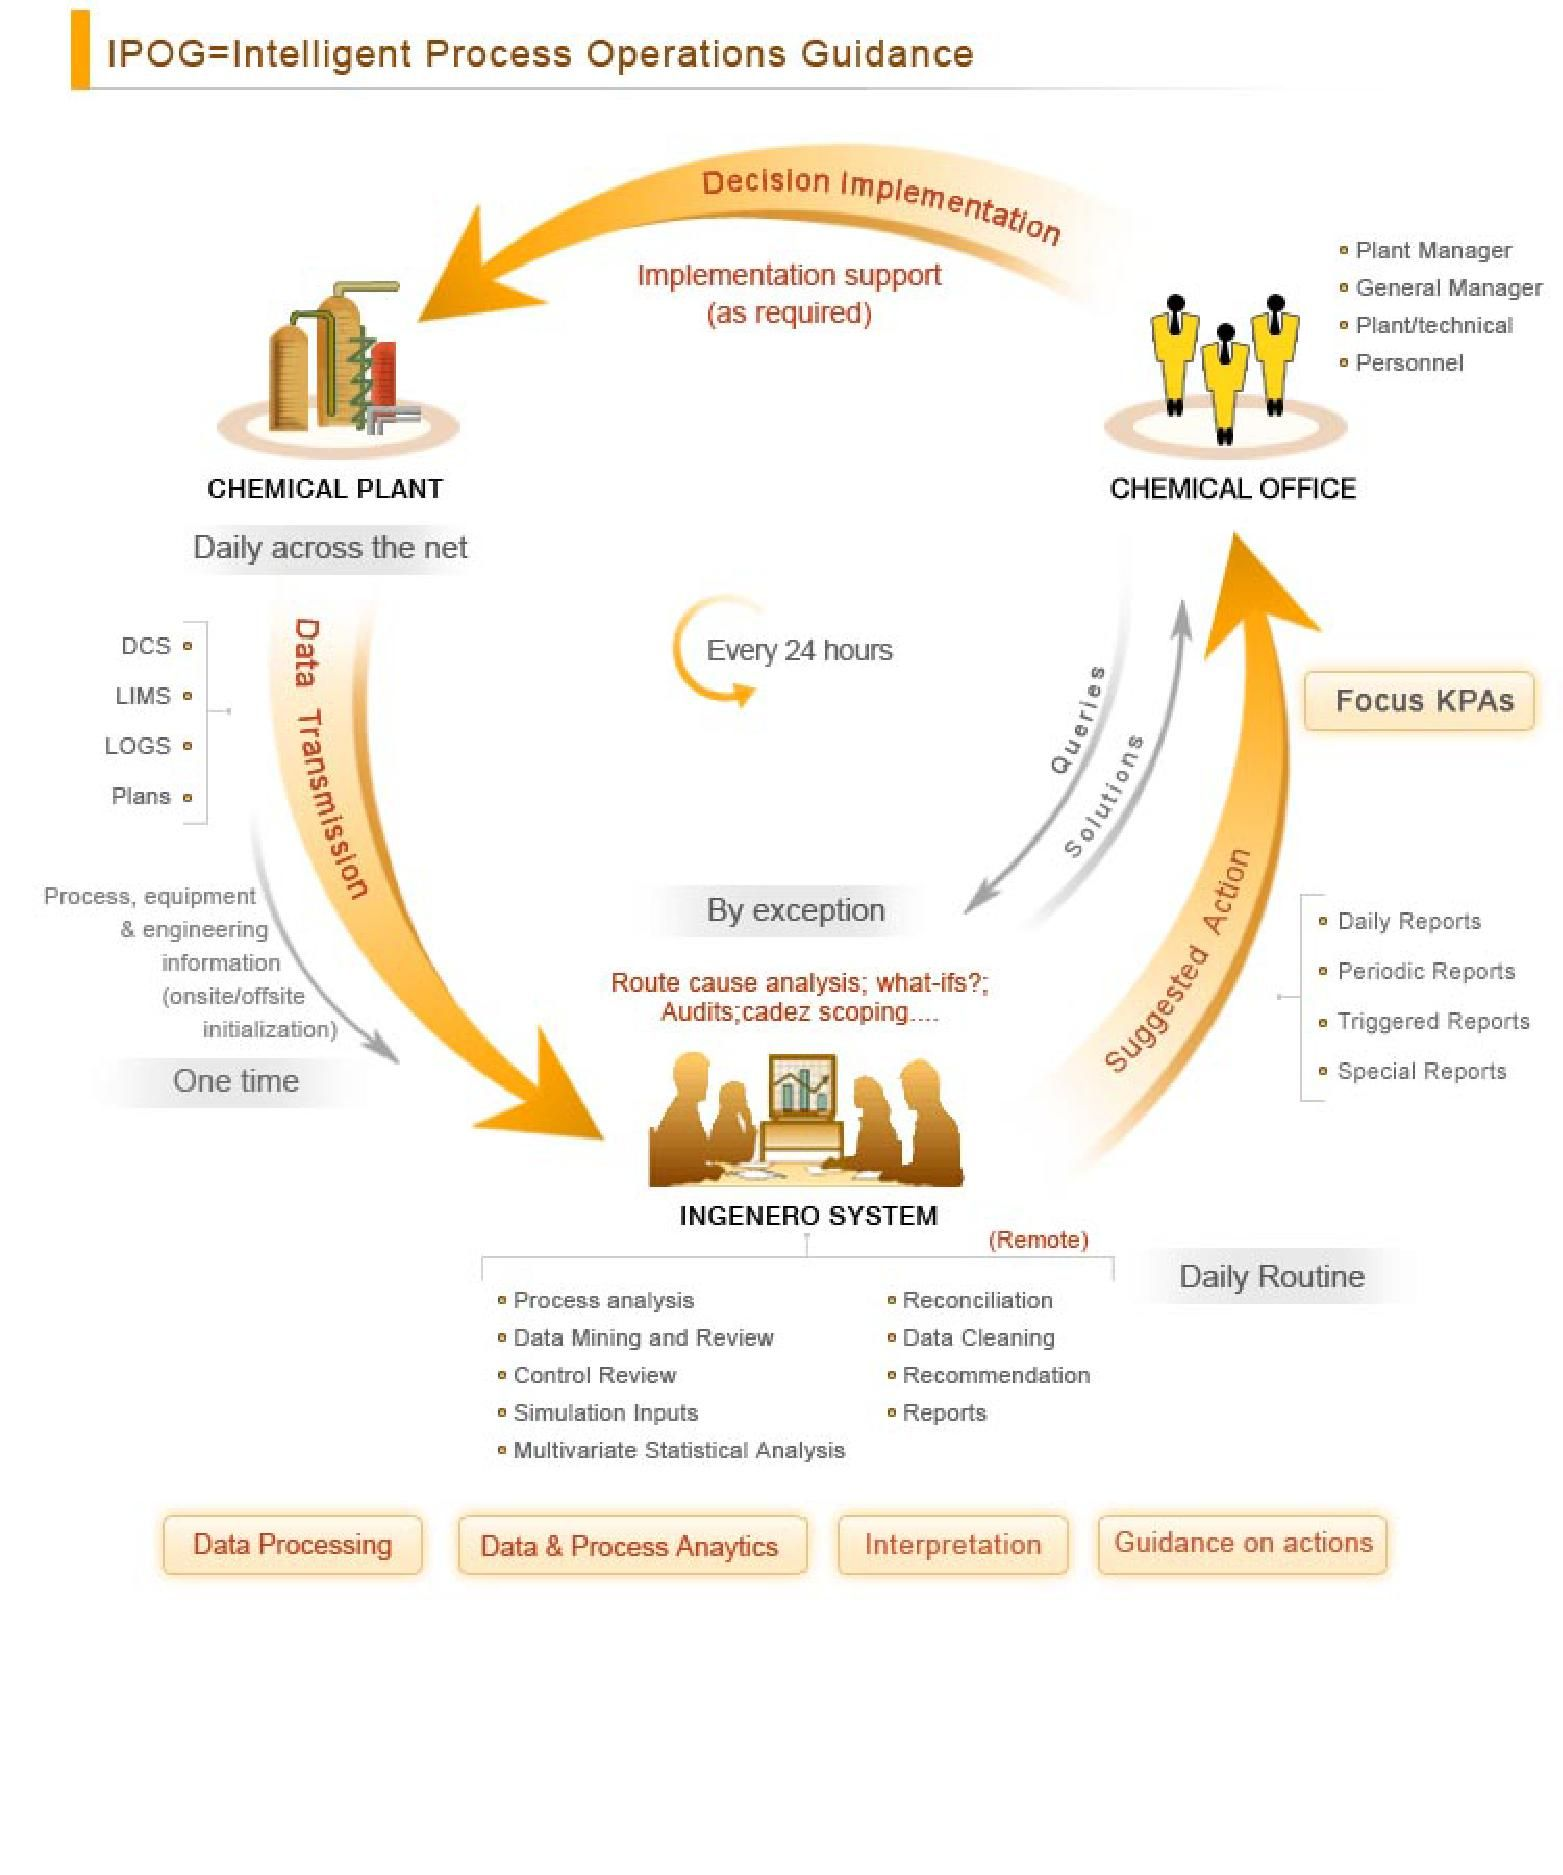 Ingenero S System Daily Routine Are Process Analysis Data Mining